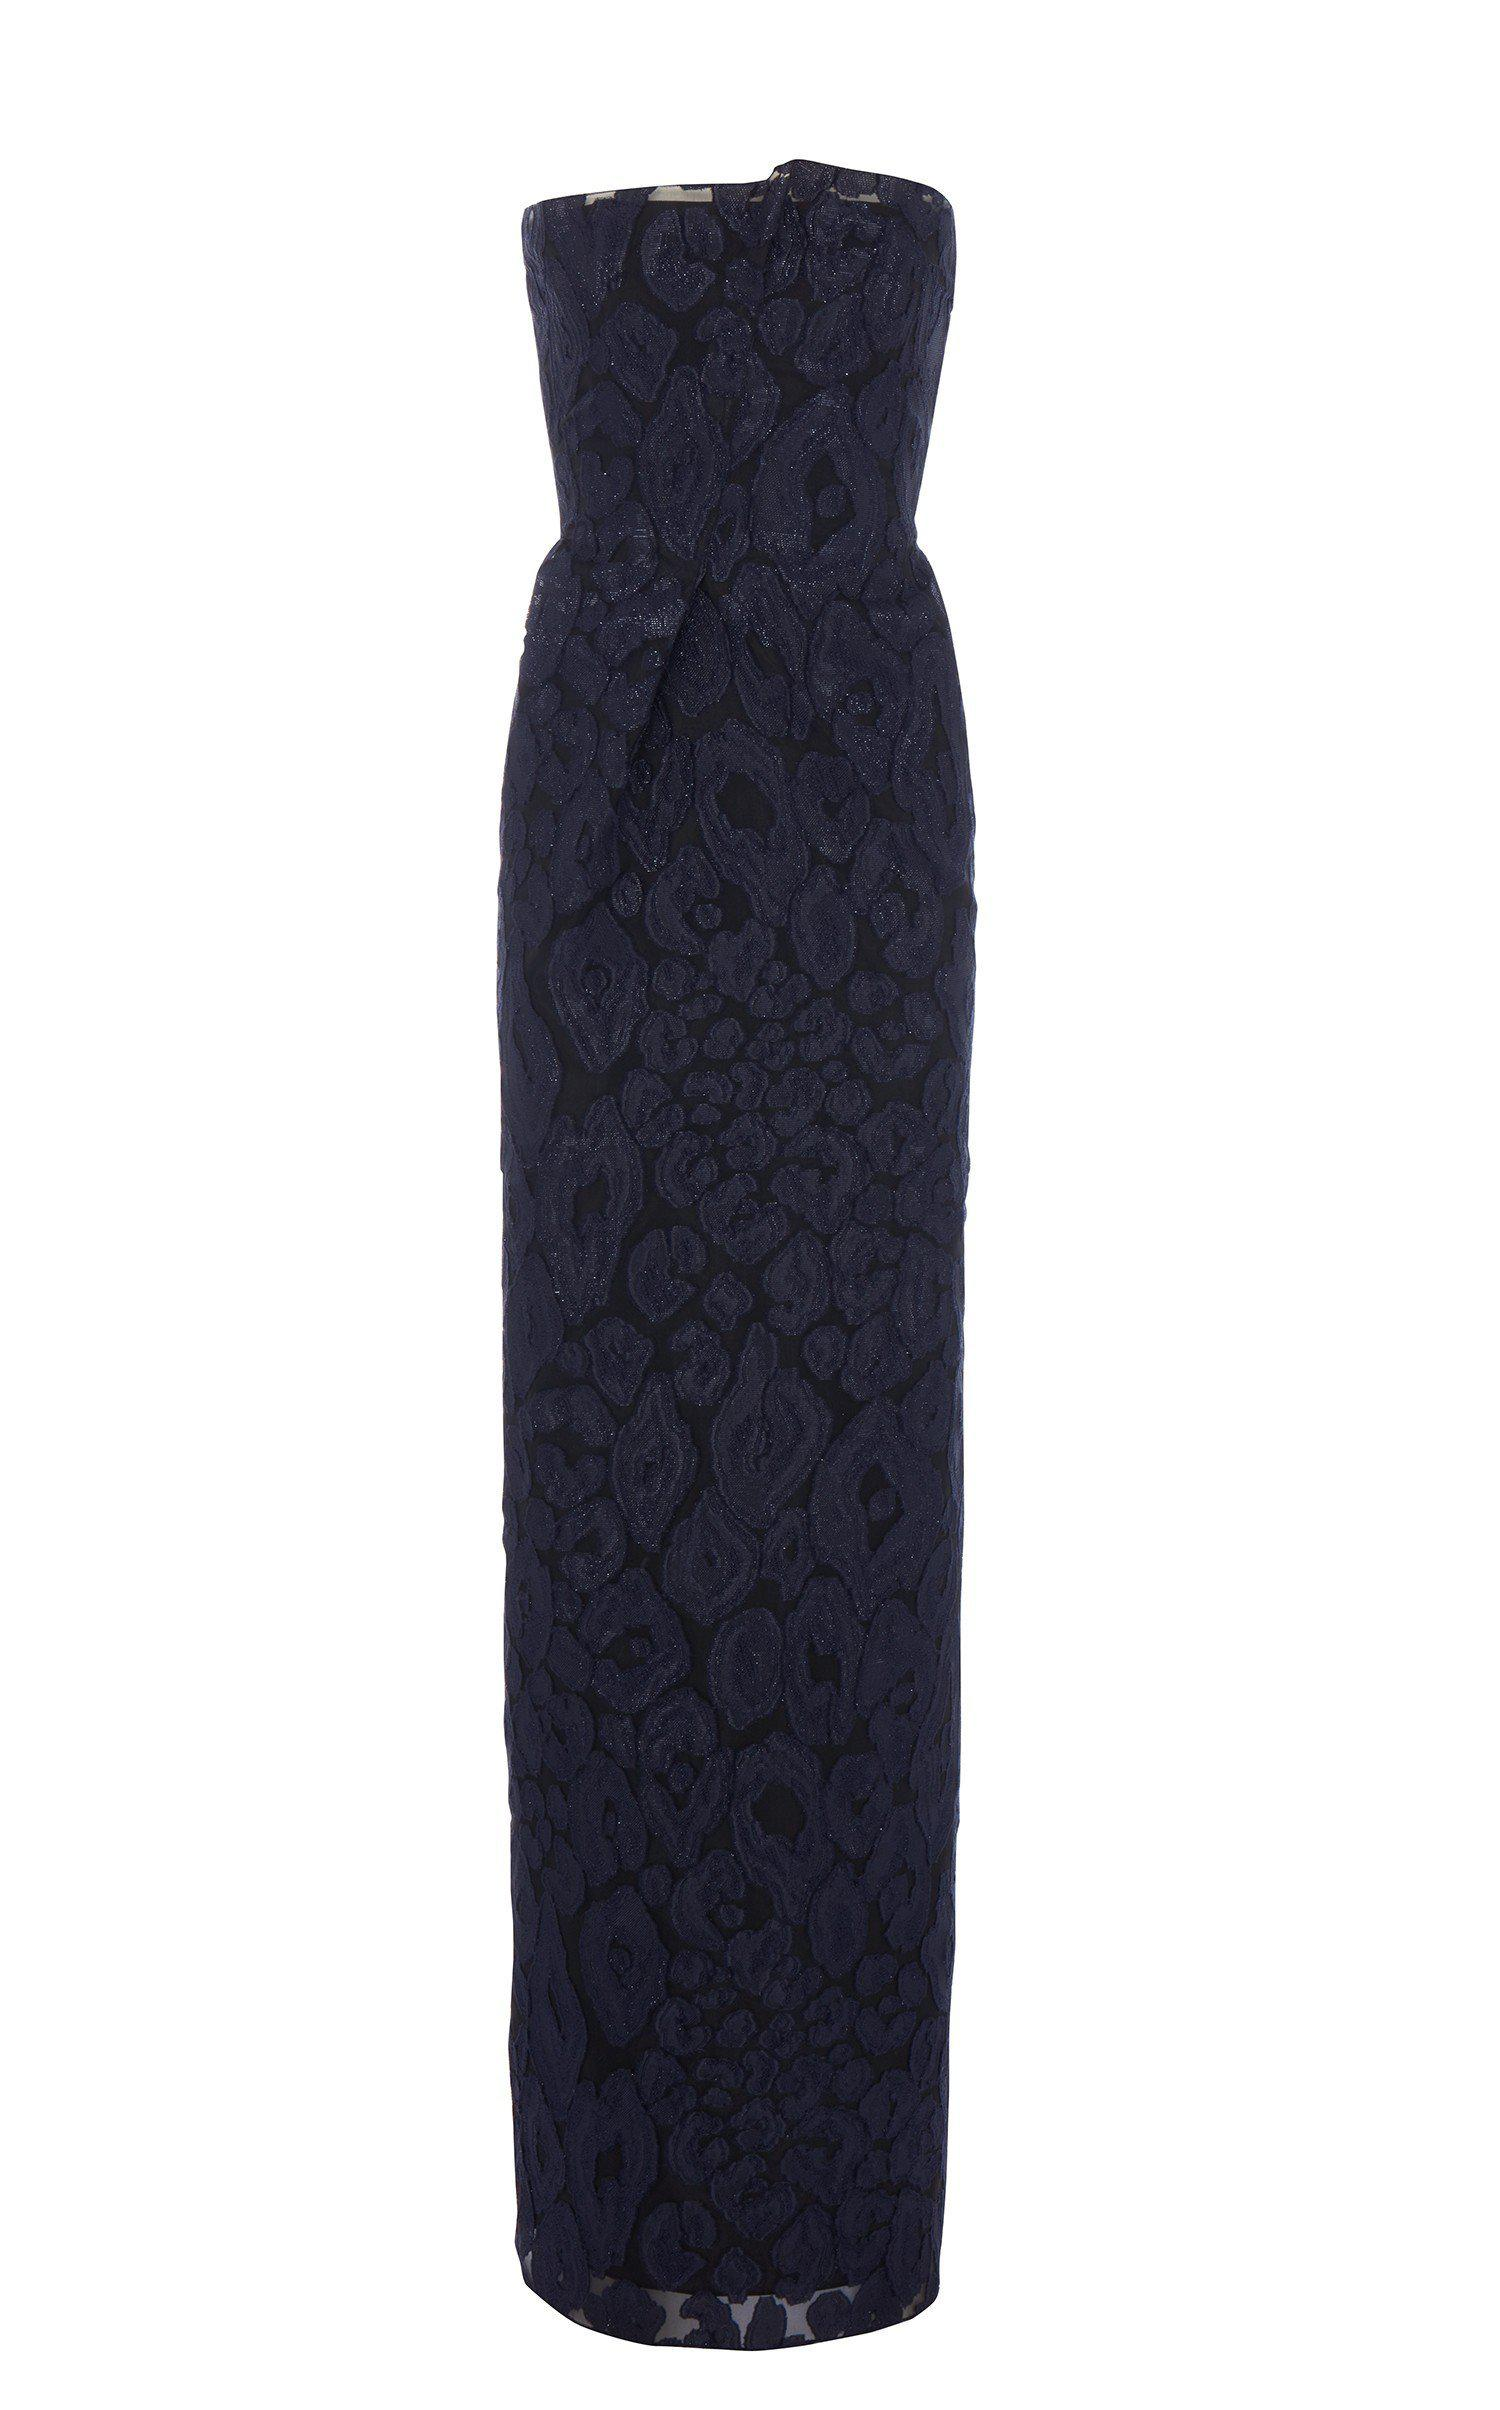 Lyst - Roland Mouret Henderson Gown in Blue - Save 60%